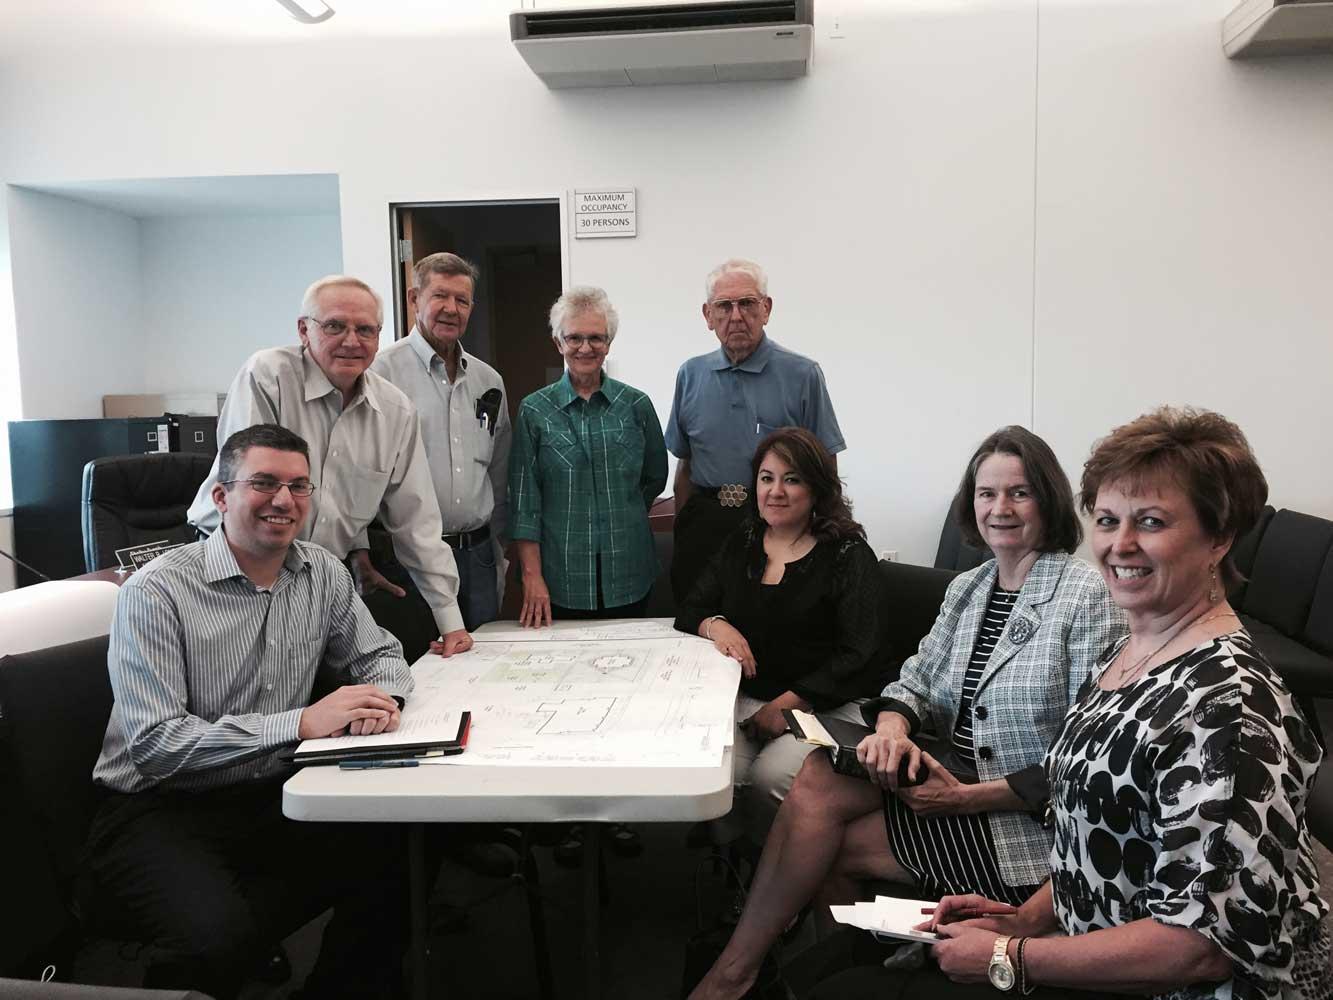 Karnes County Building Committee